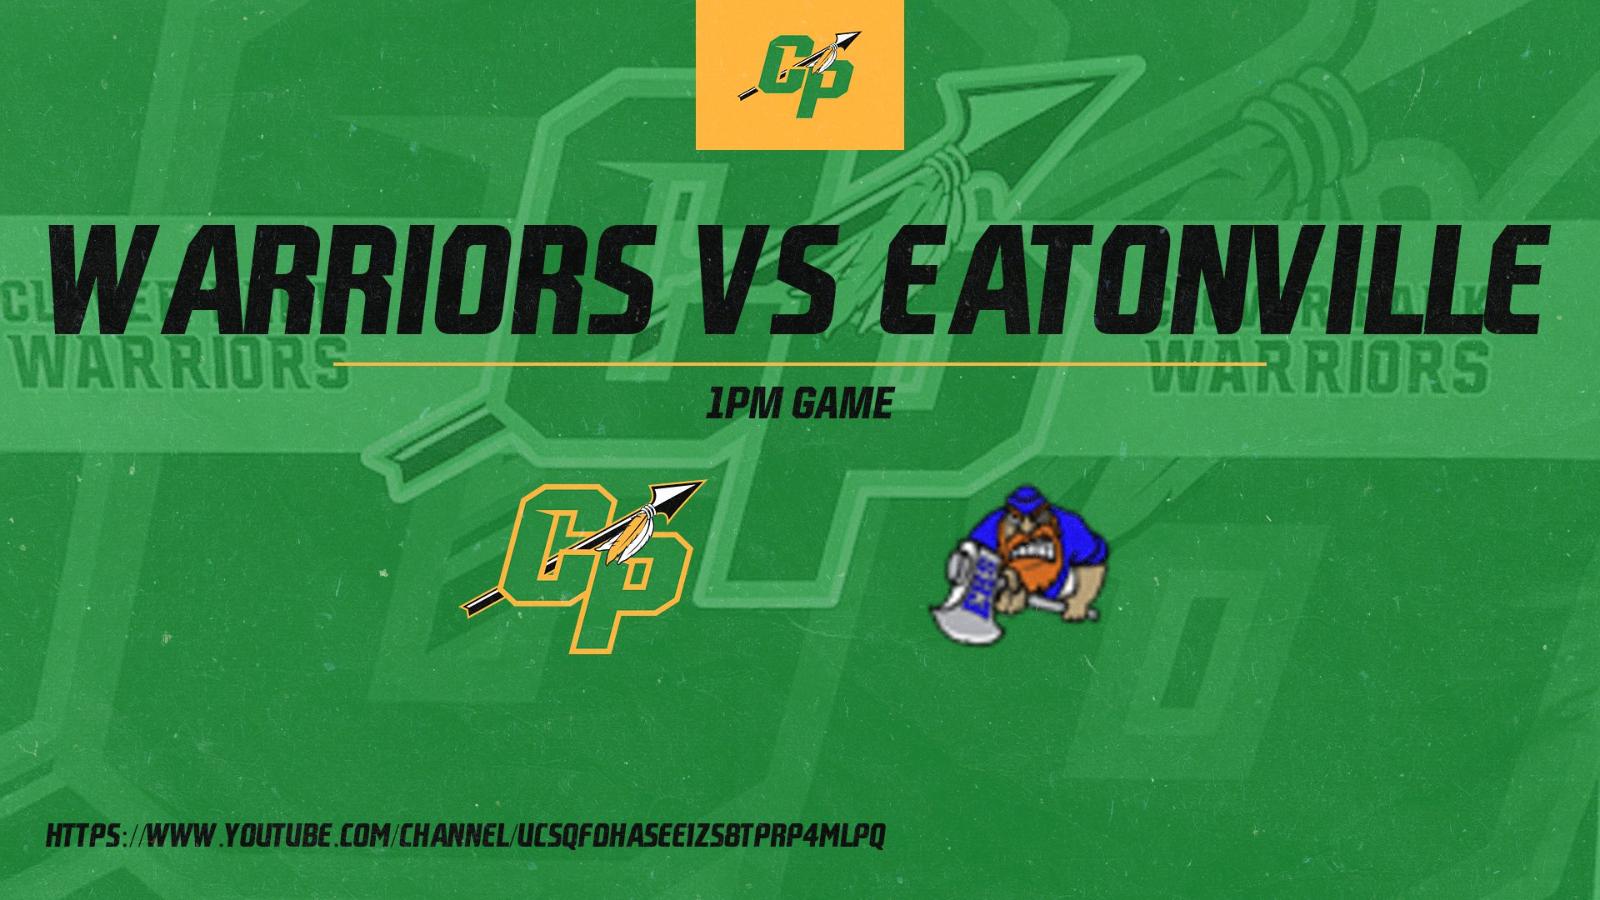 Warrior Vs Eatonville 1pm